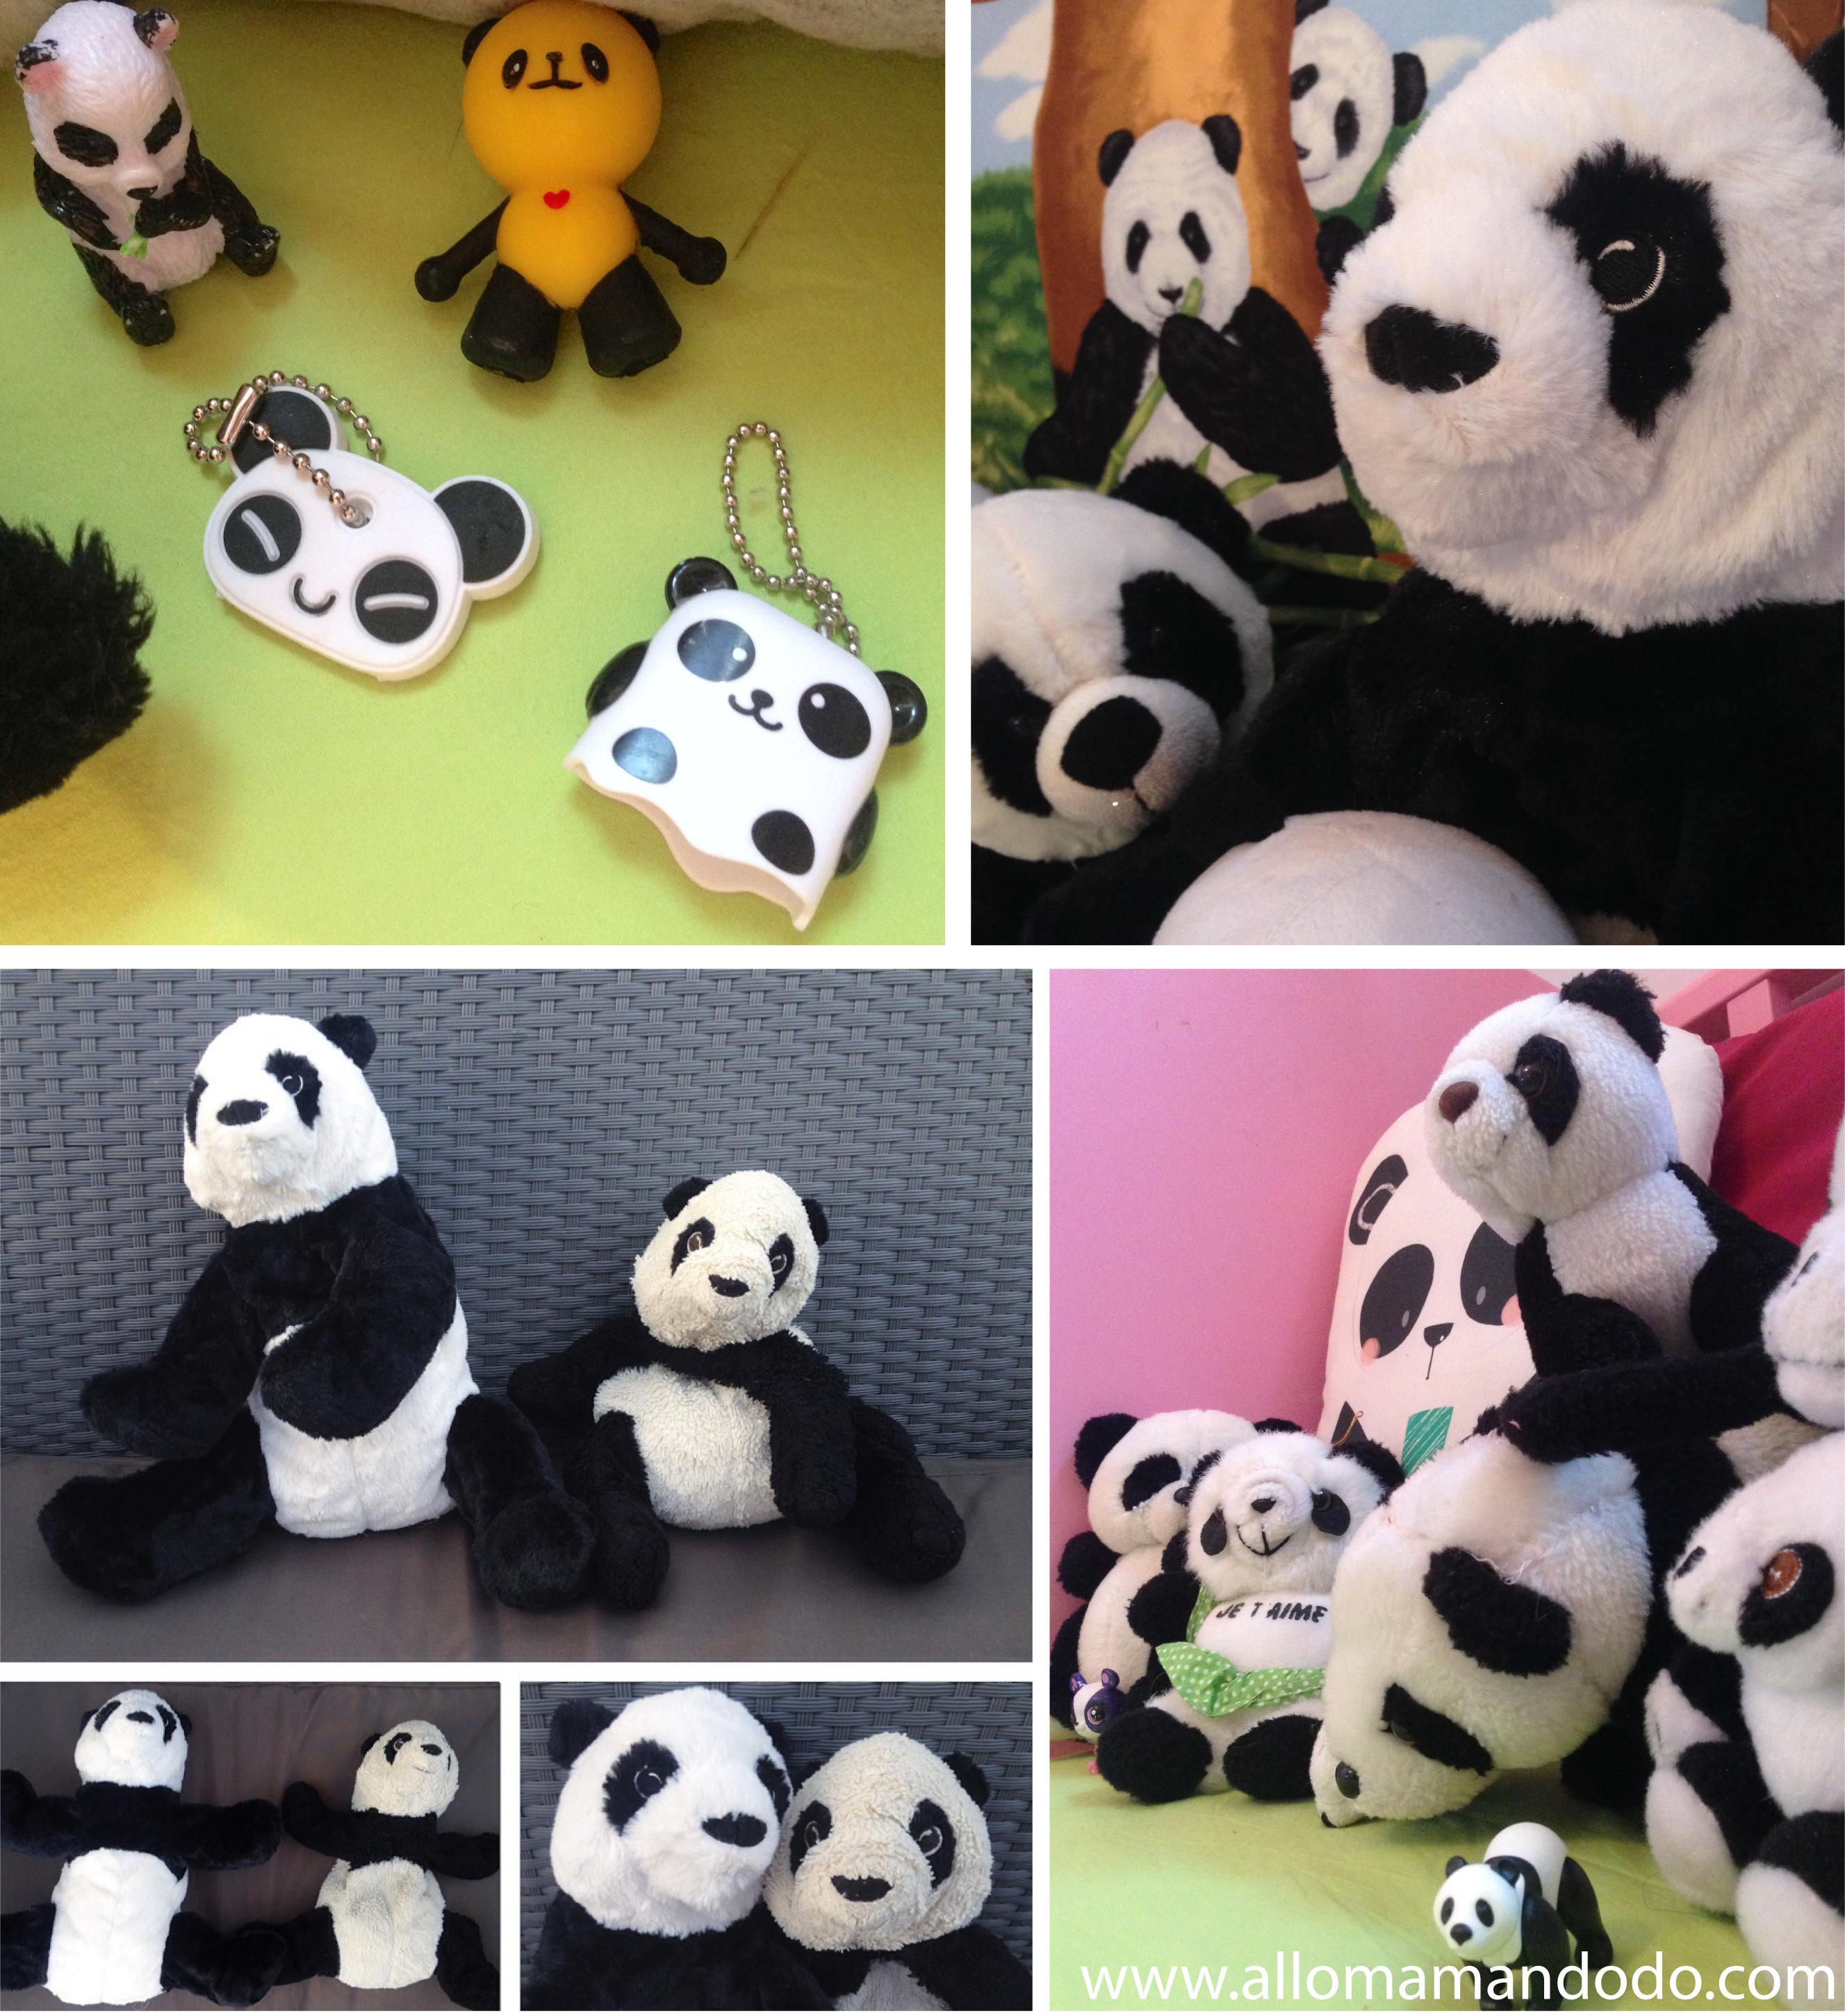 ma fille est une panda addict sa collection en photo allo maman dodo. Black Bedroom Furniture Sets. Home Design Ideas